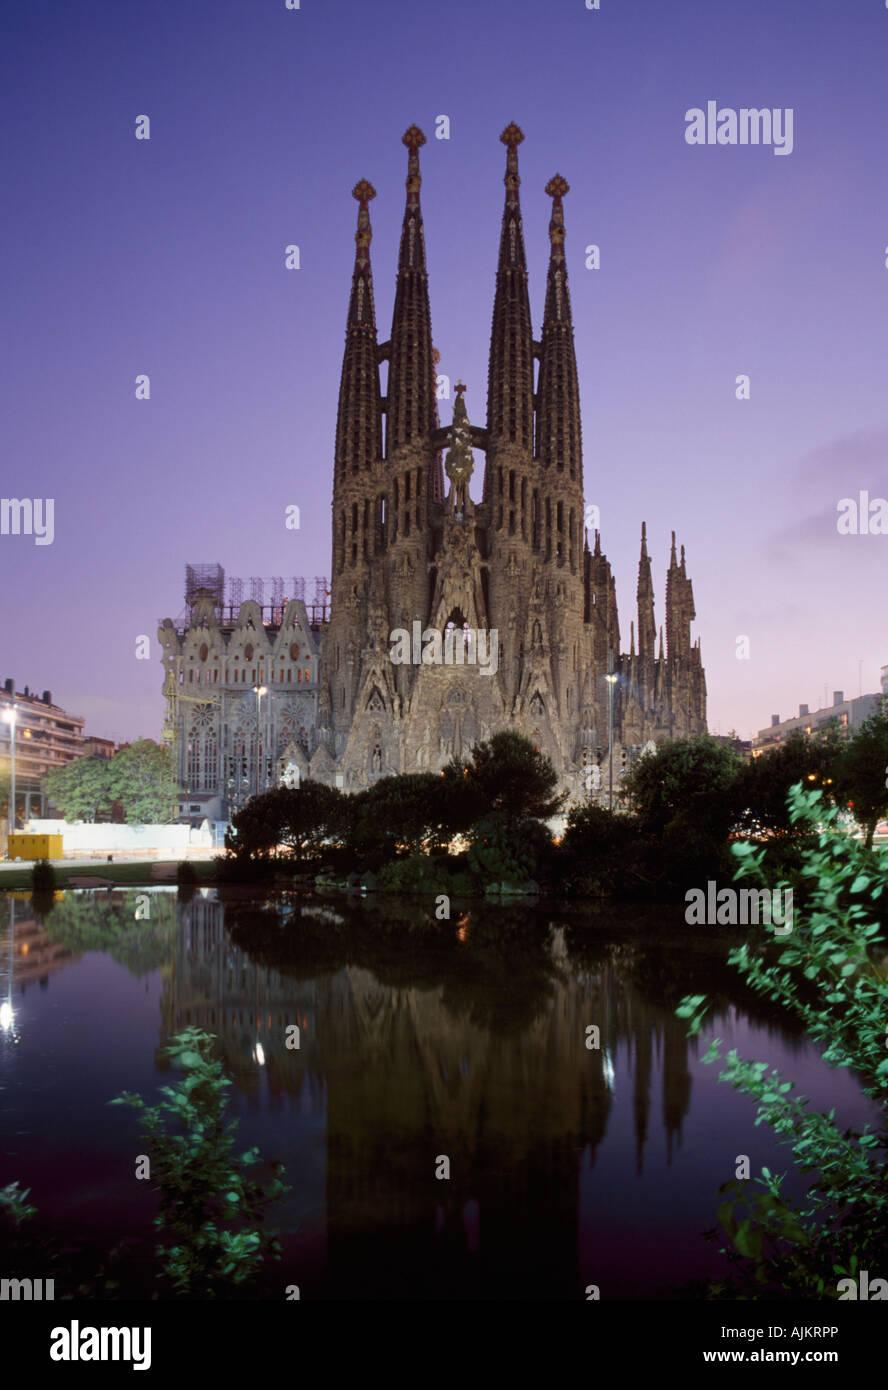 Catedral de la Sagrada Familia Templo de la Sagrada Familia Expaitori Barcelona Cataluña España Imagen De Stock